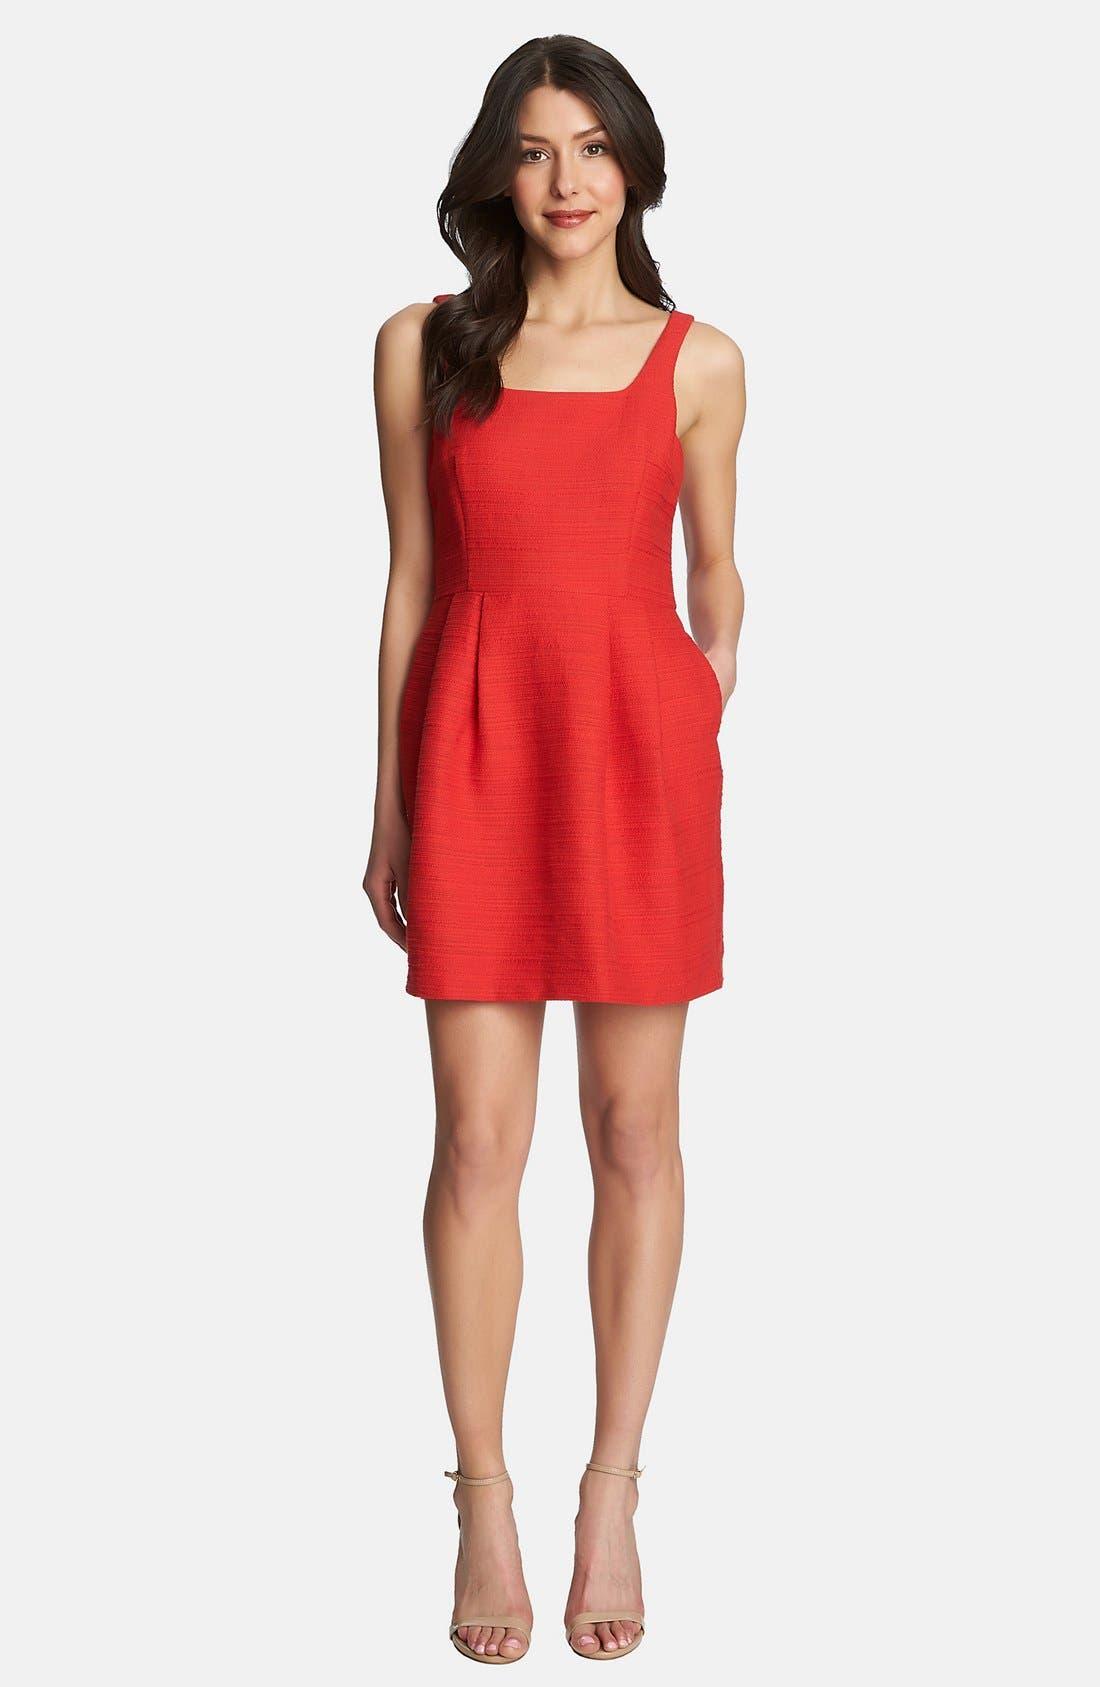 Main Image - 1.STATE Square Neck Tweed Dress